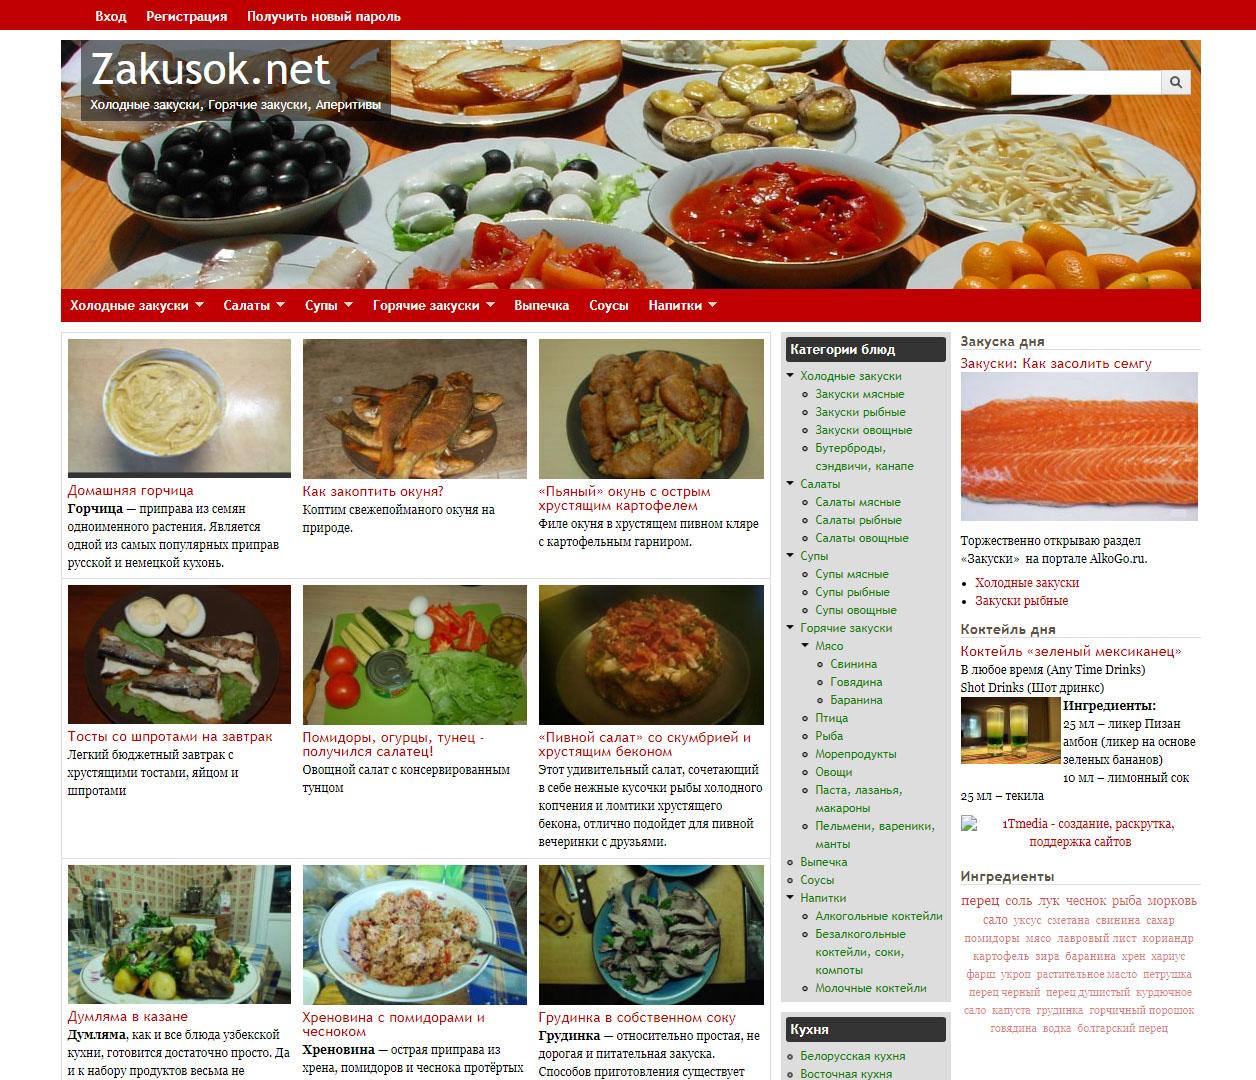 Кулинарный сайт zakusok.net